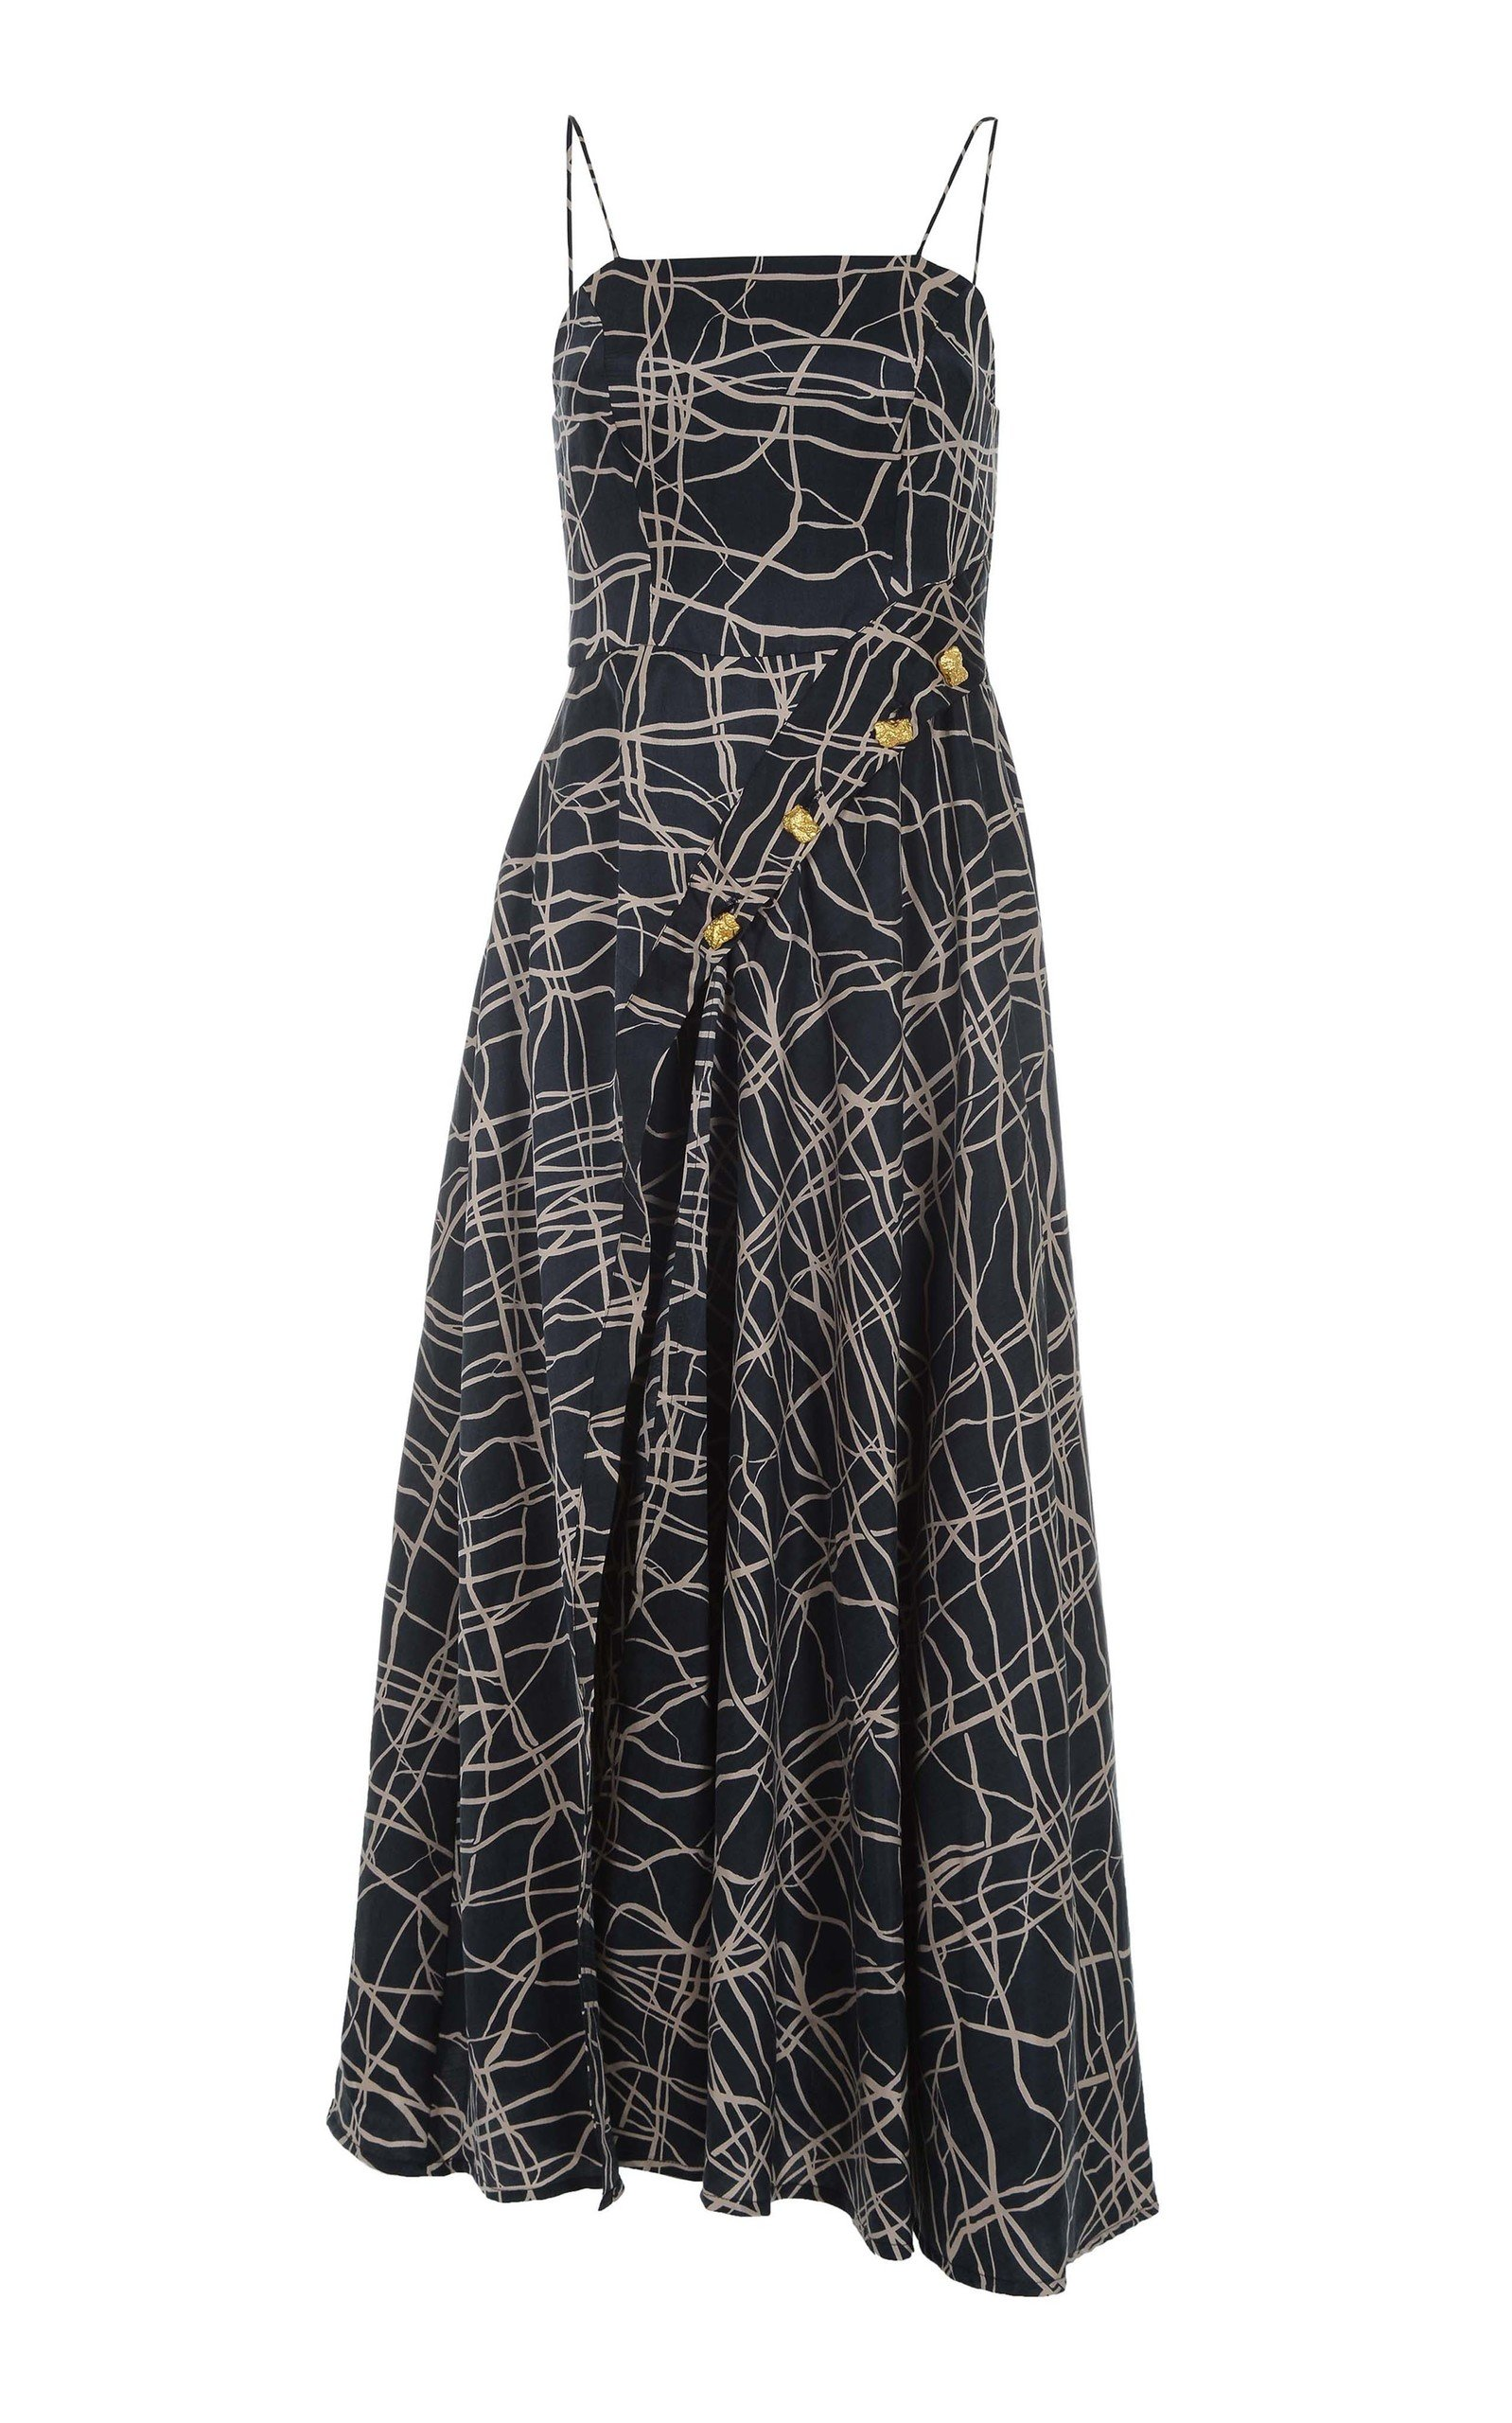 AMAL AL MULLA Asymmetrical Cotton-Blend Maxi Dress in Navy